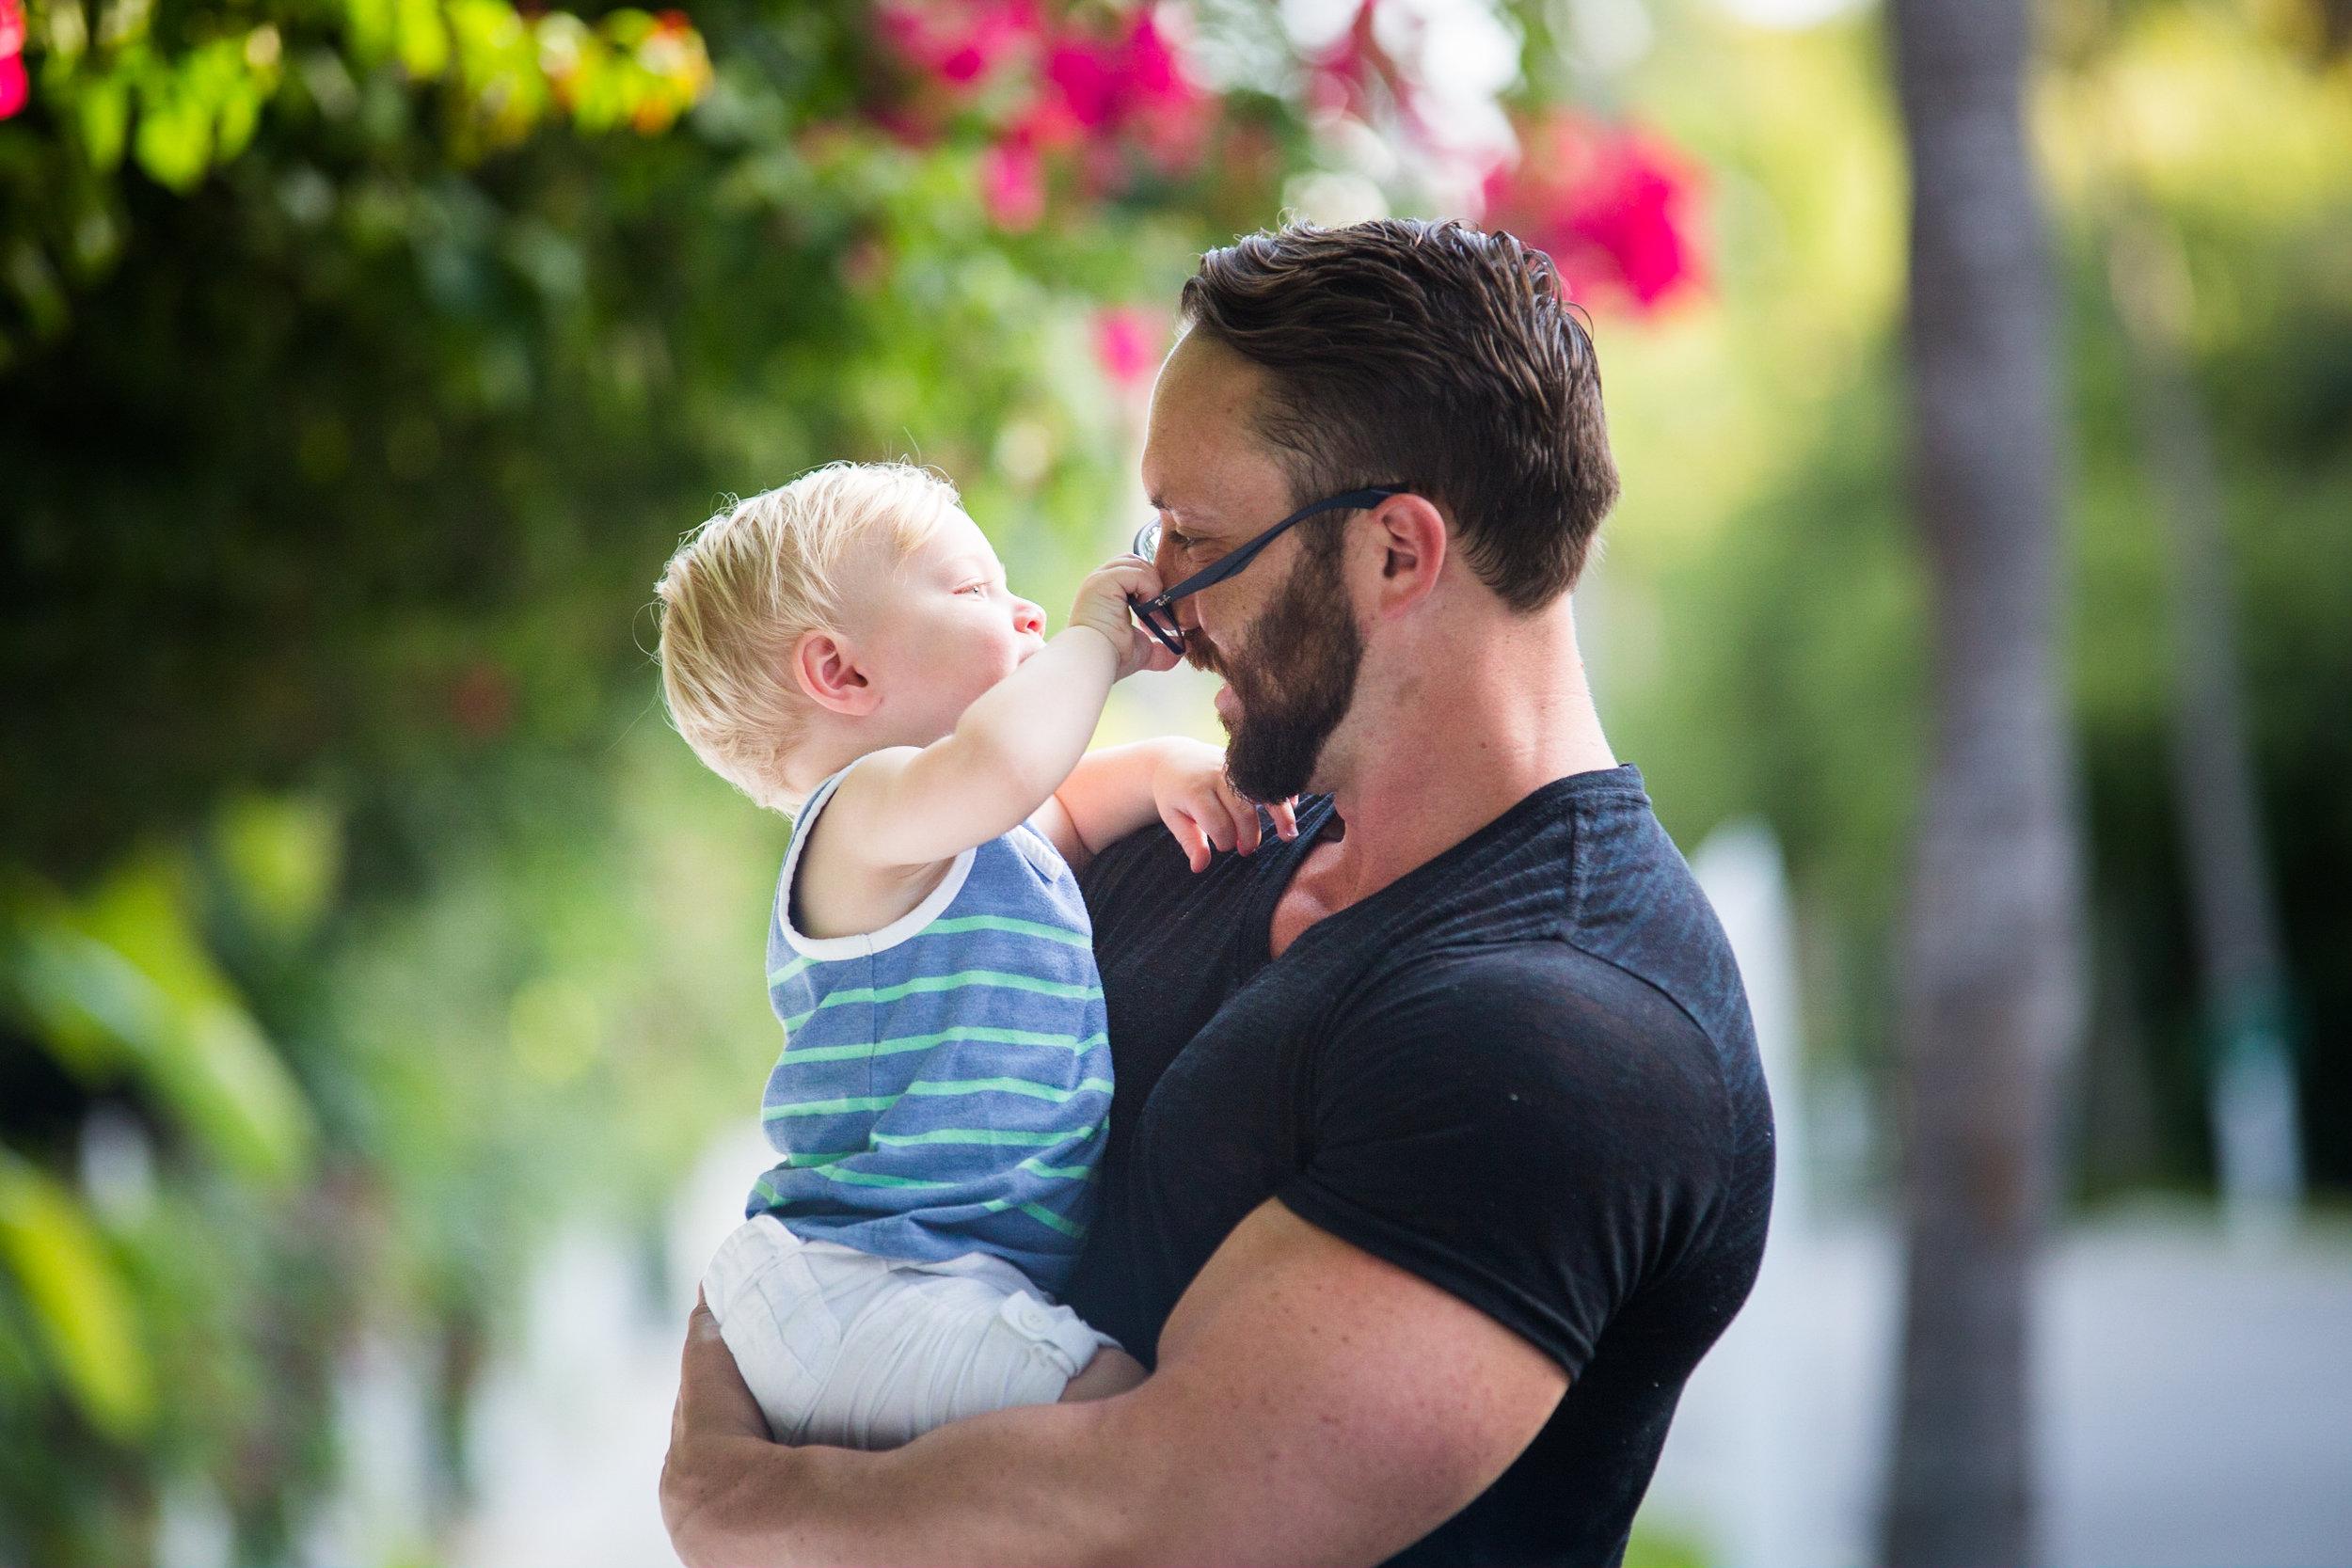 Little-Boy-Grabs-Dads-Glasses-During-Key-West-Family-Portrait-Session.jpg